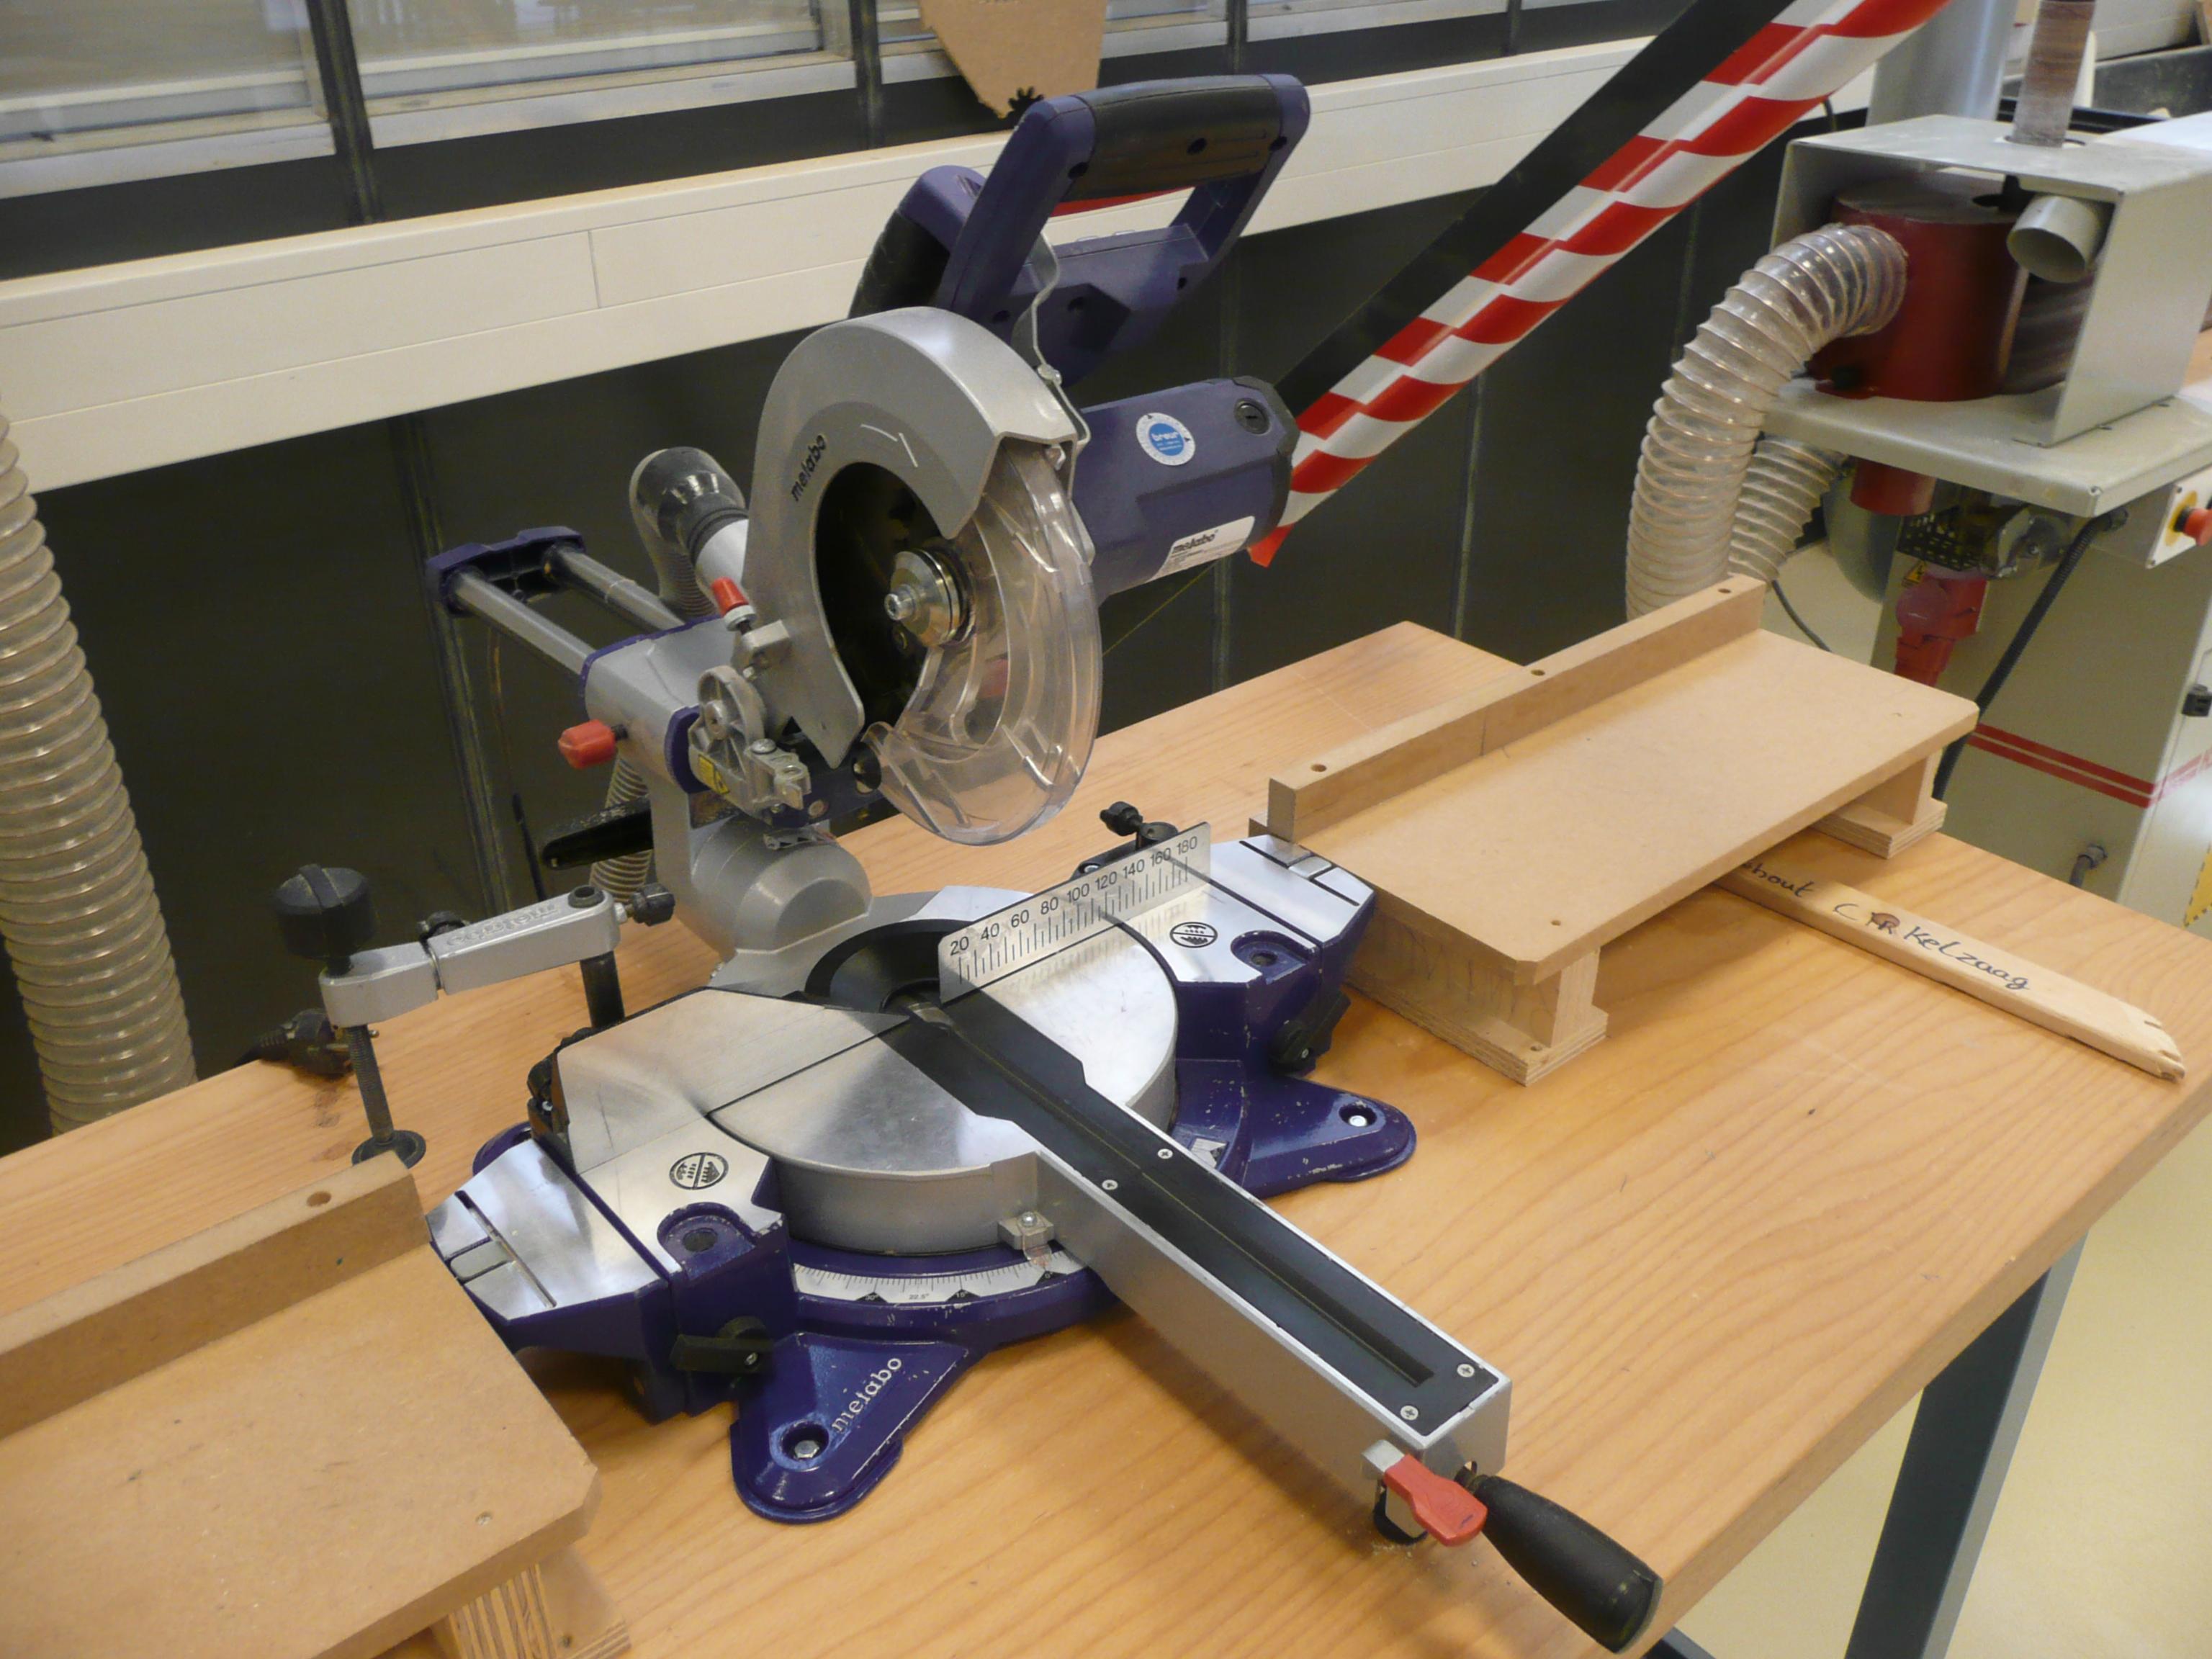 Cirkelzaag rdm makerspace - Metabo kgs 216 m ...